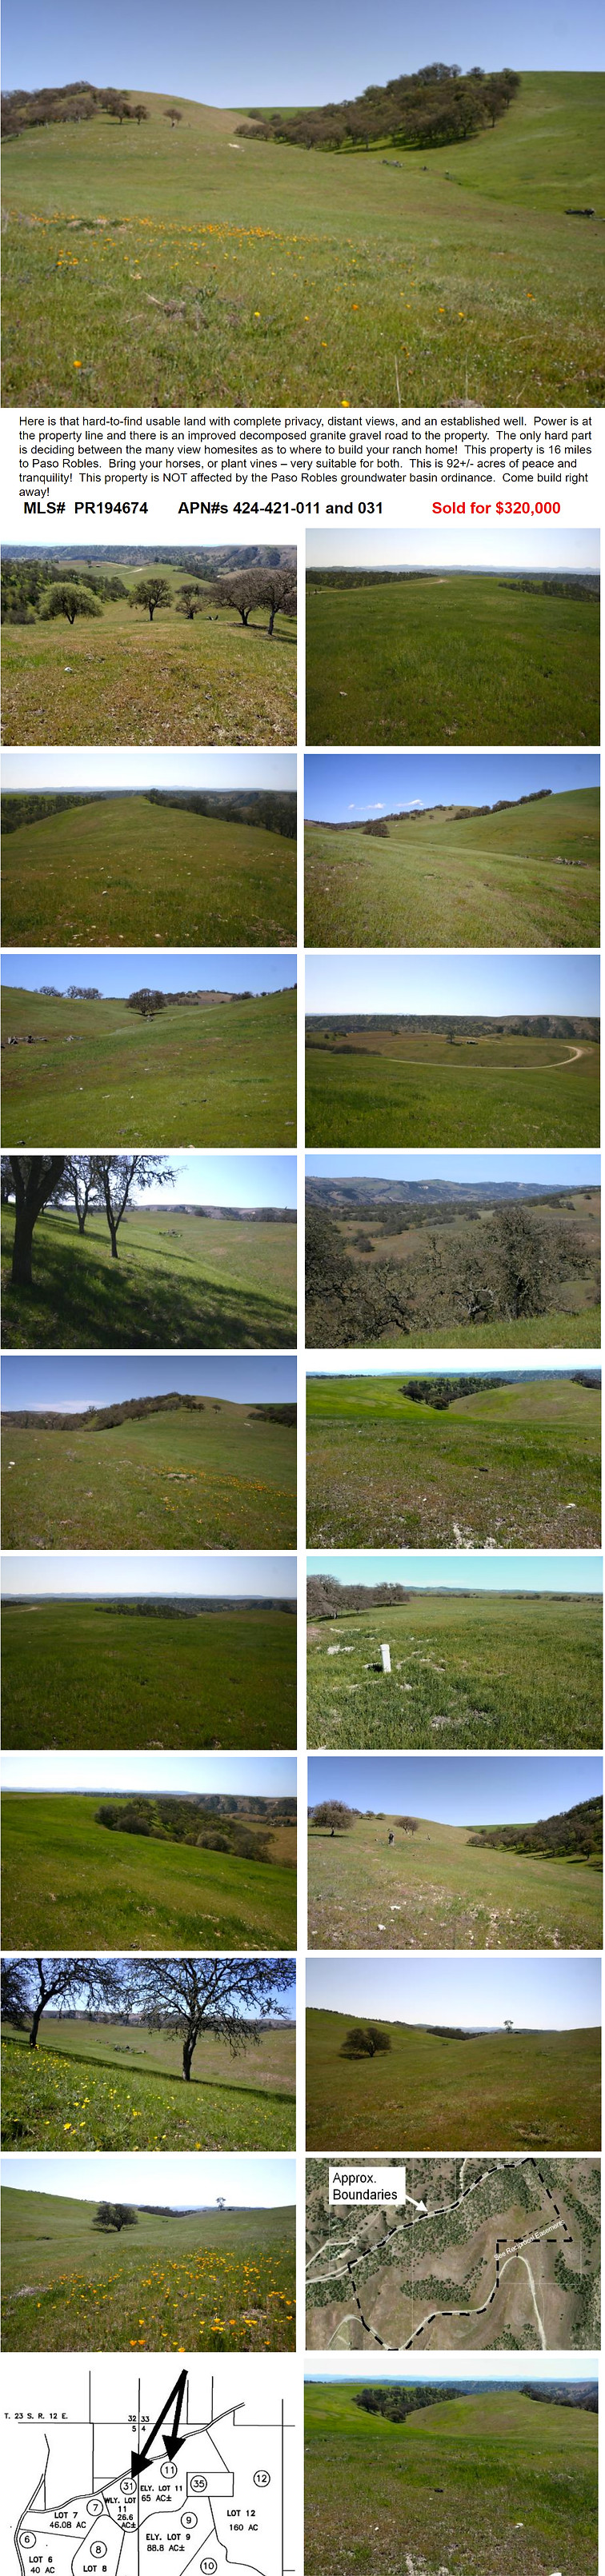 indian-valley-ranch-11.jpg